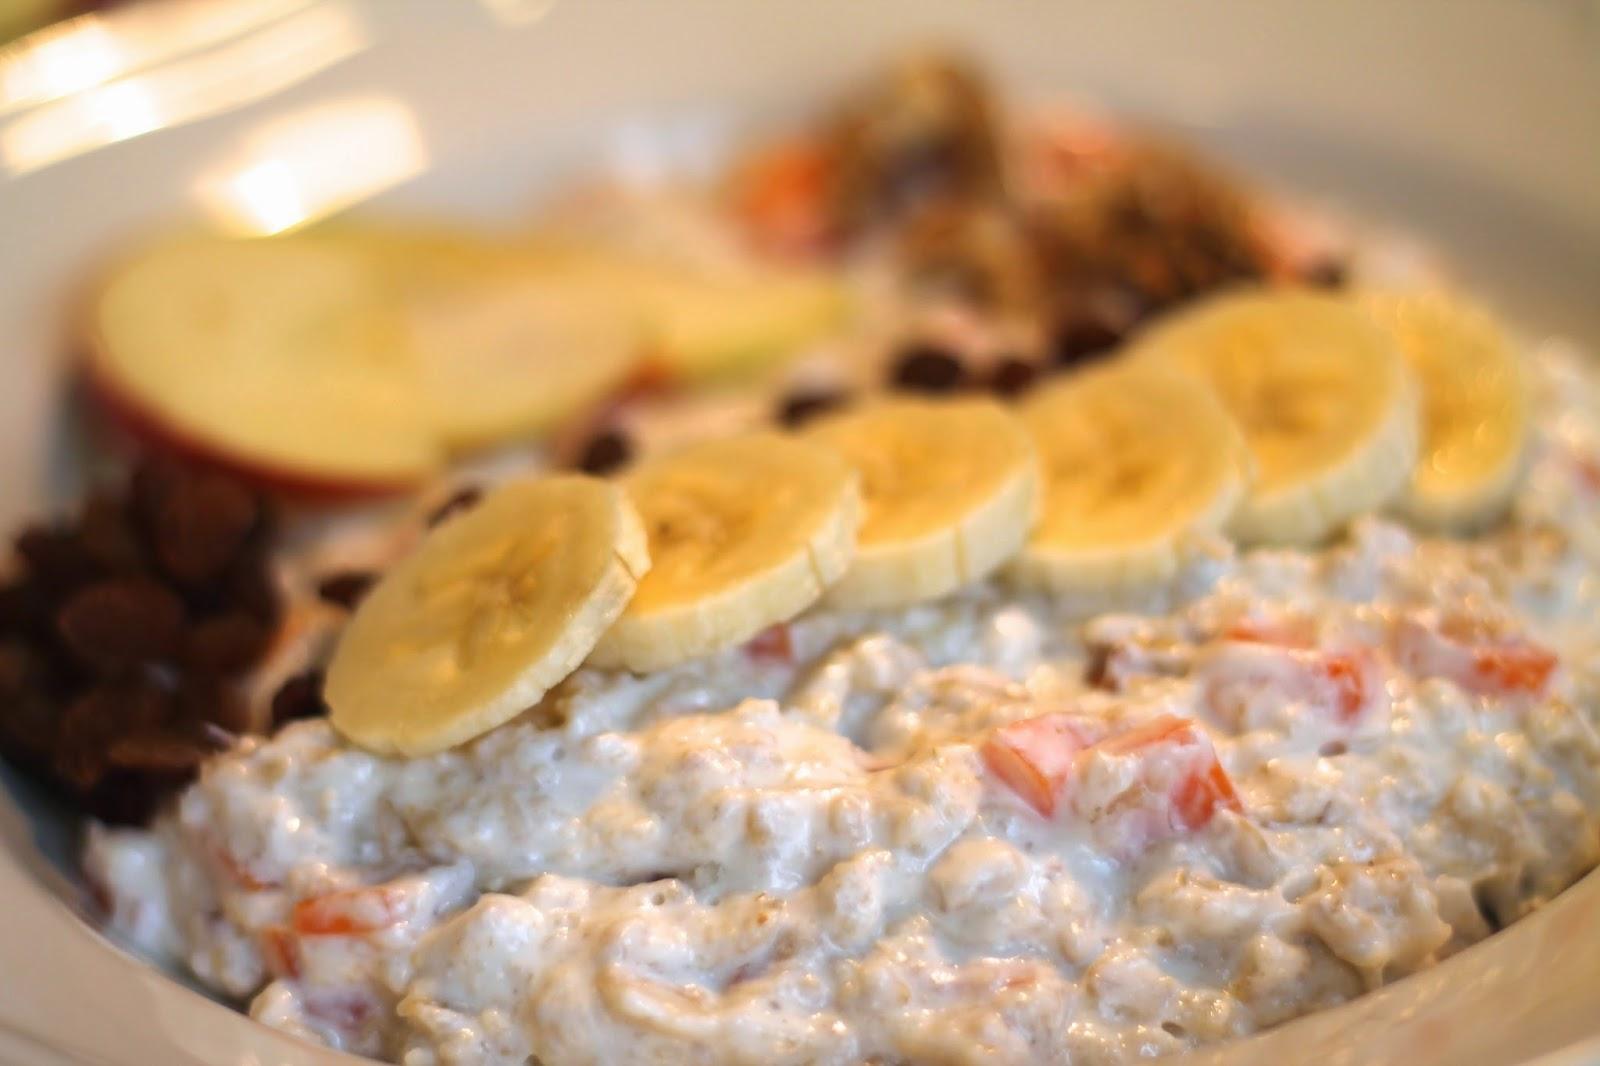 Porridge / Recipe / Kayla Itsines HELP Plan / Autumn Porridge / Oatmel / Haferbrei / Sojamilch / Apfel / Rosnine / Zwetschken/ Pflaumen /